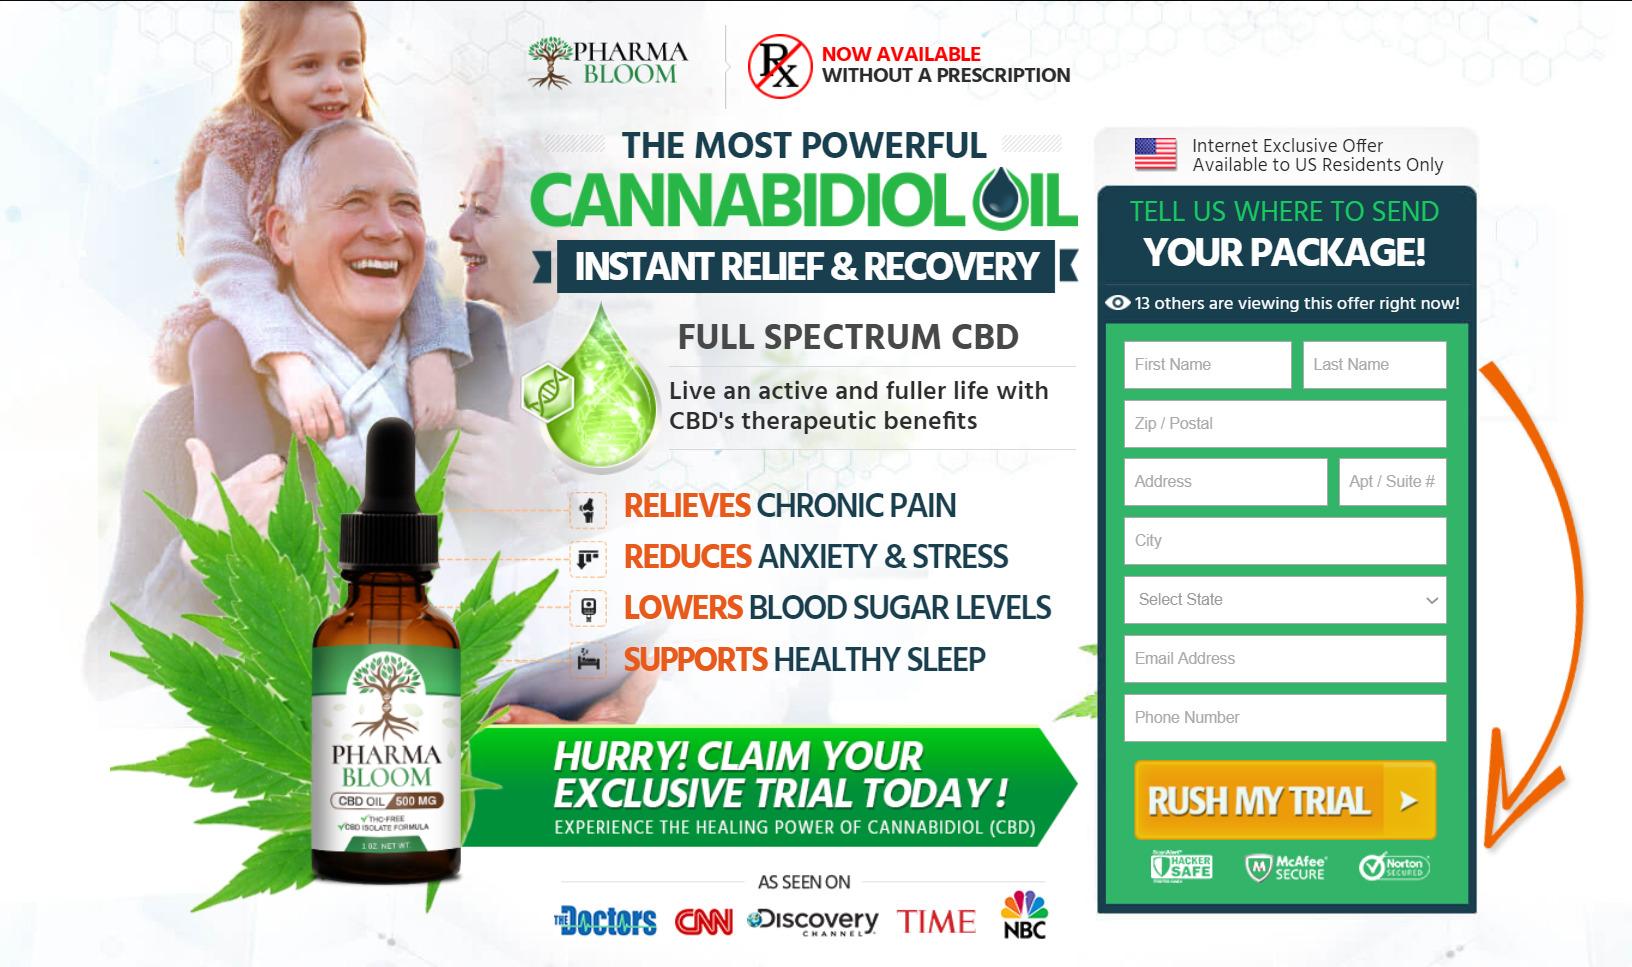 Pharma bloom cbd oil